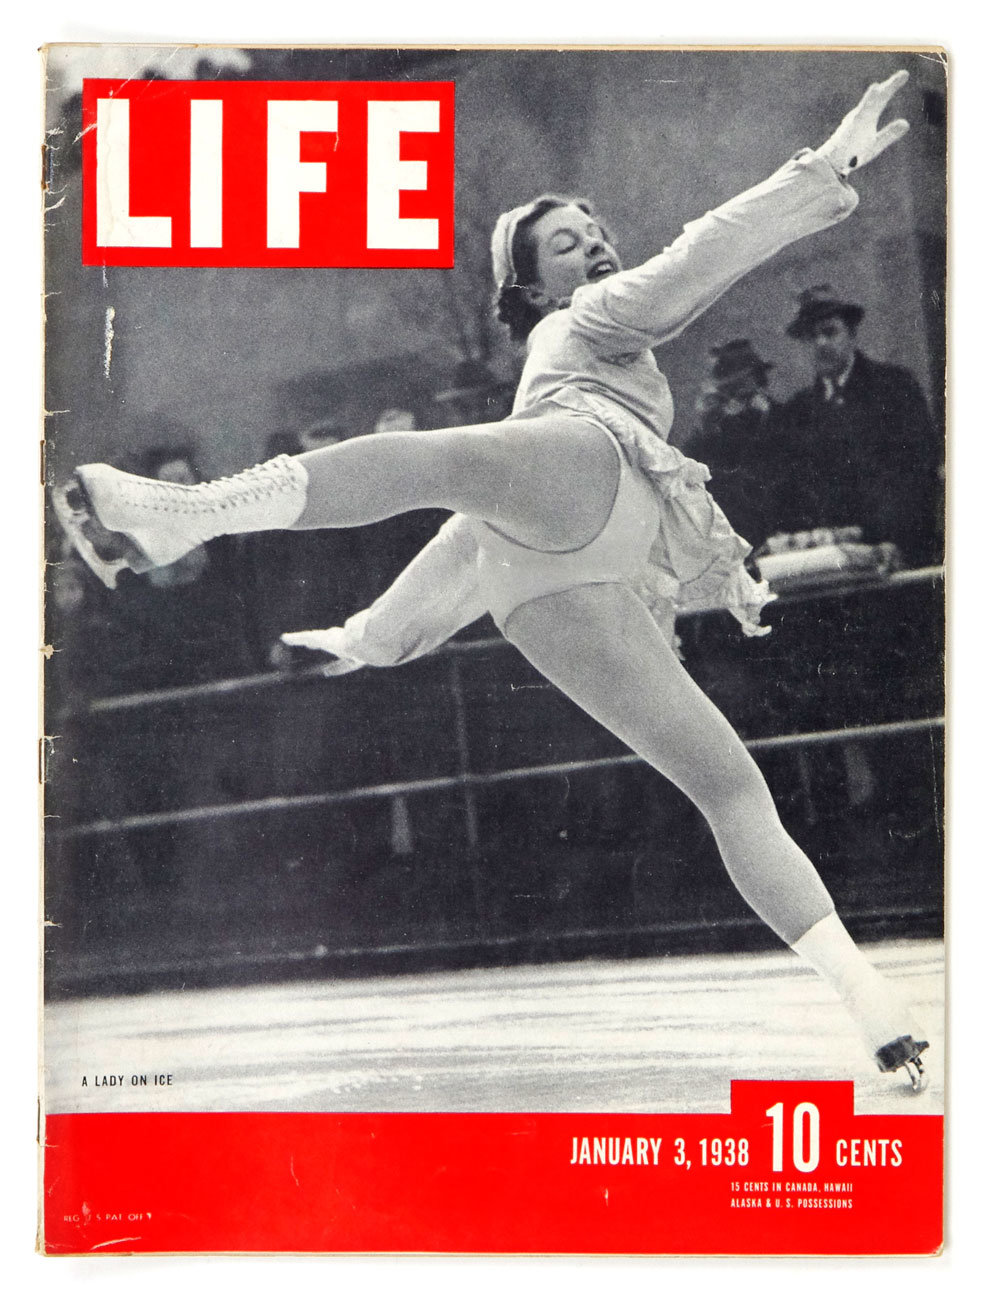 LIFE Magazine 1938 January 3 A Lady On Ice